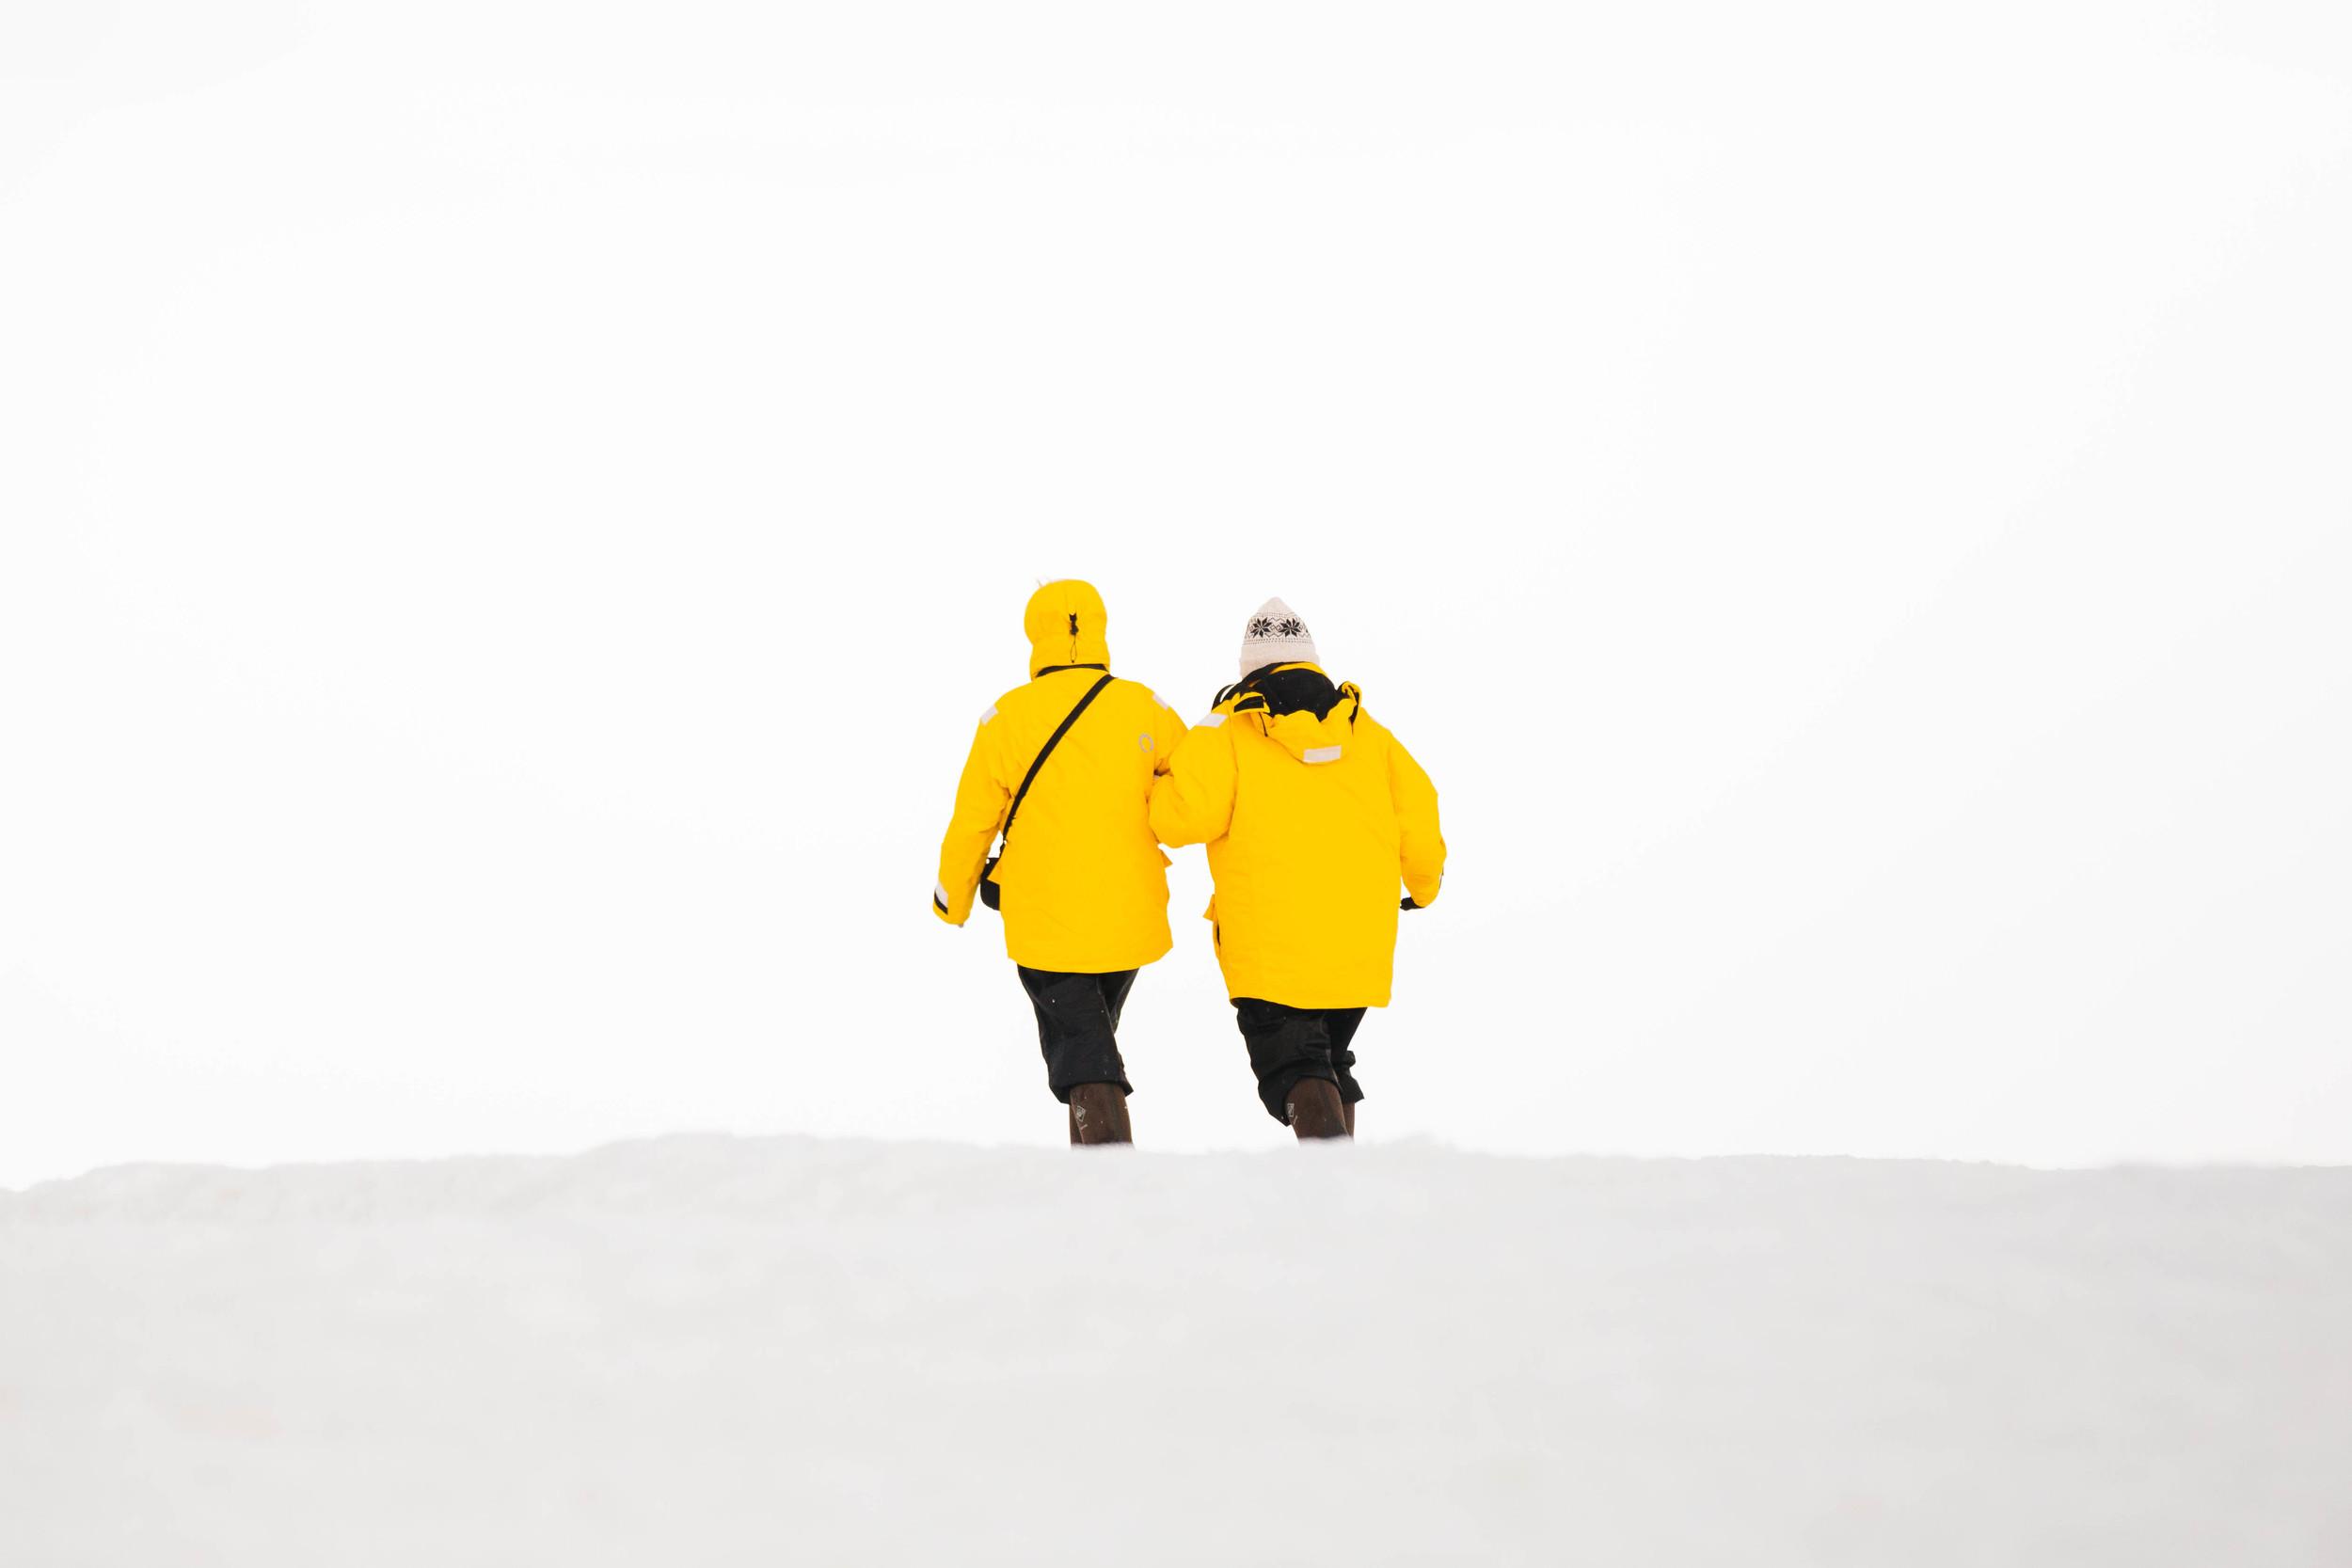 Passengers walking on shore wearing signature, bright yellow Quark parkas.